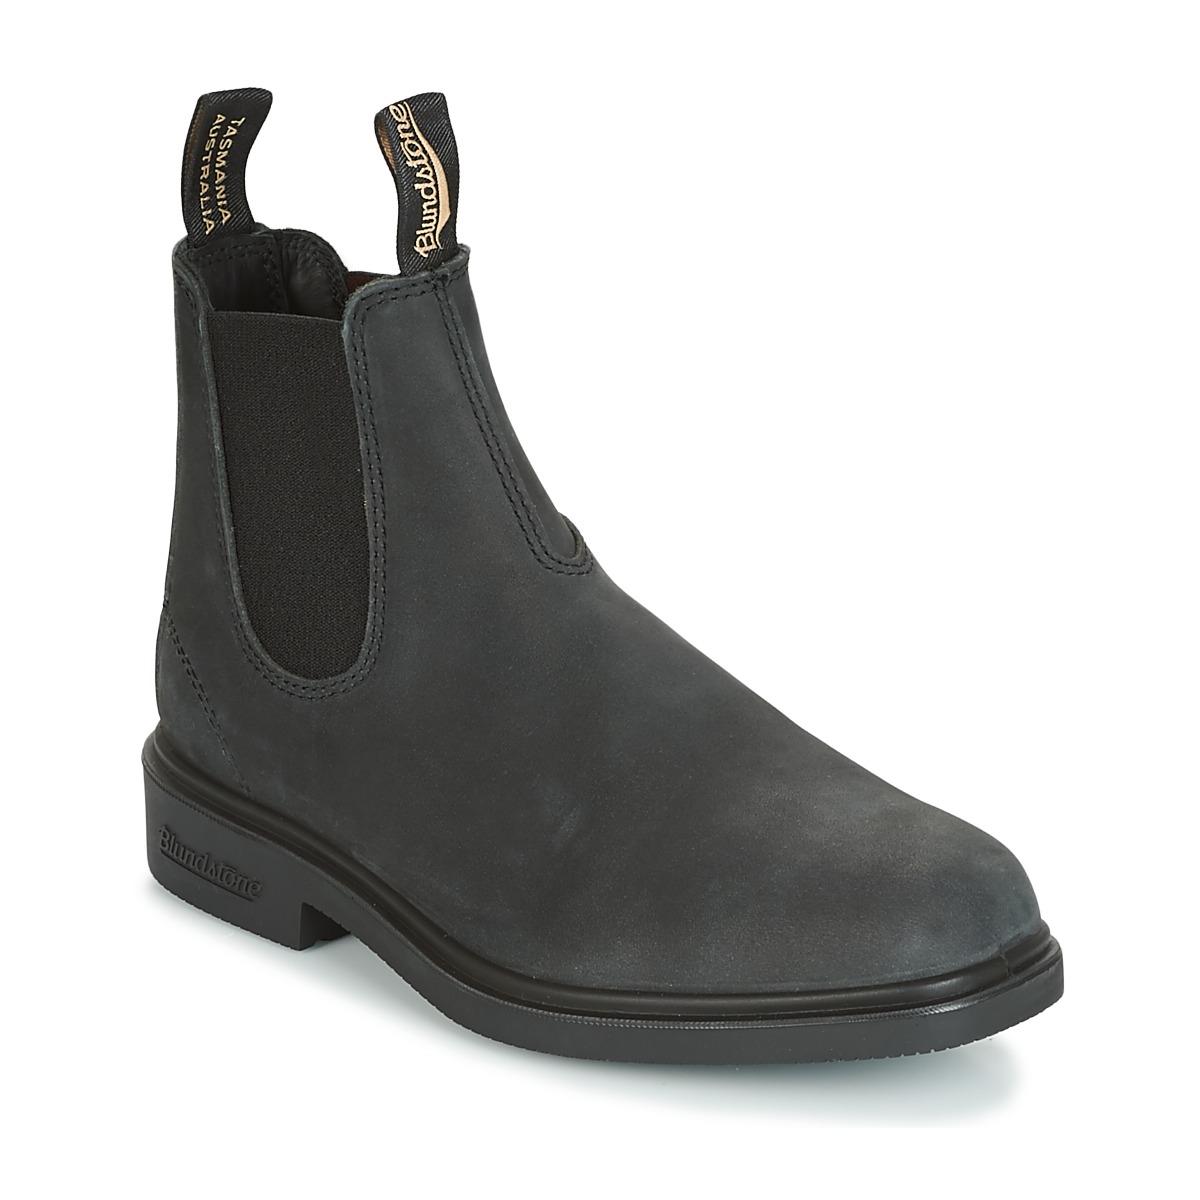 Blundstone DRESS BOOT Grau - Kostenloser Versand bei Spartoode ! - Schuhe Boots  185,00 €